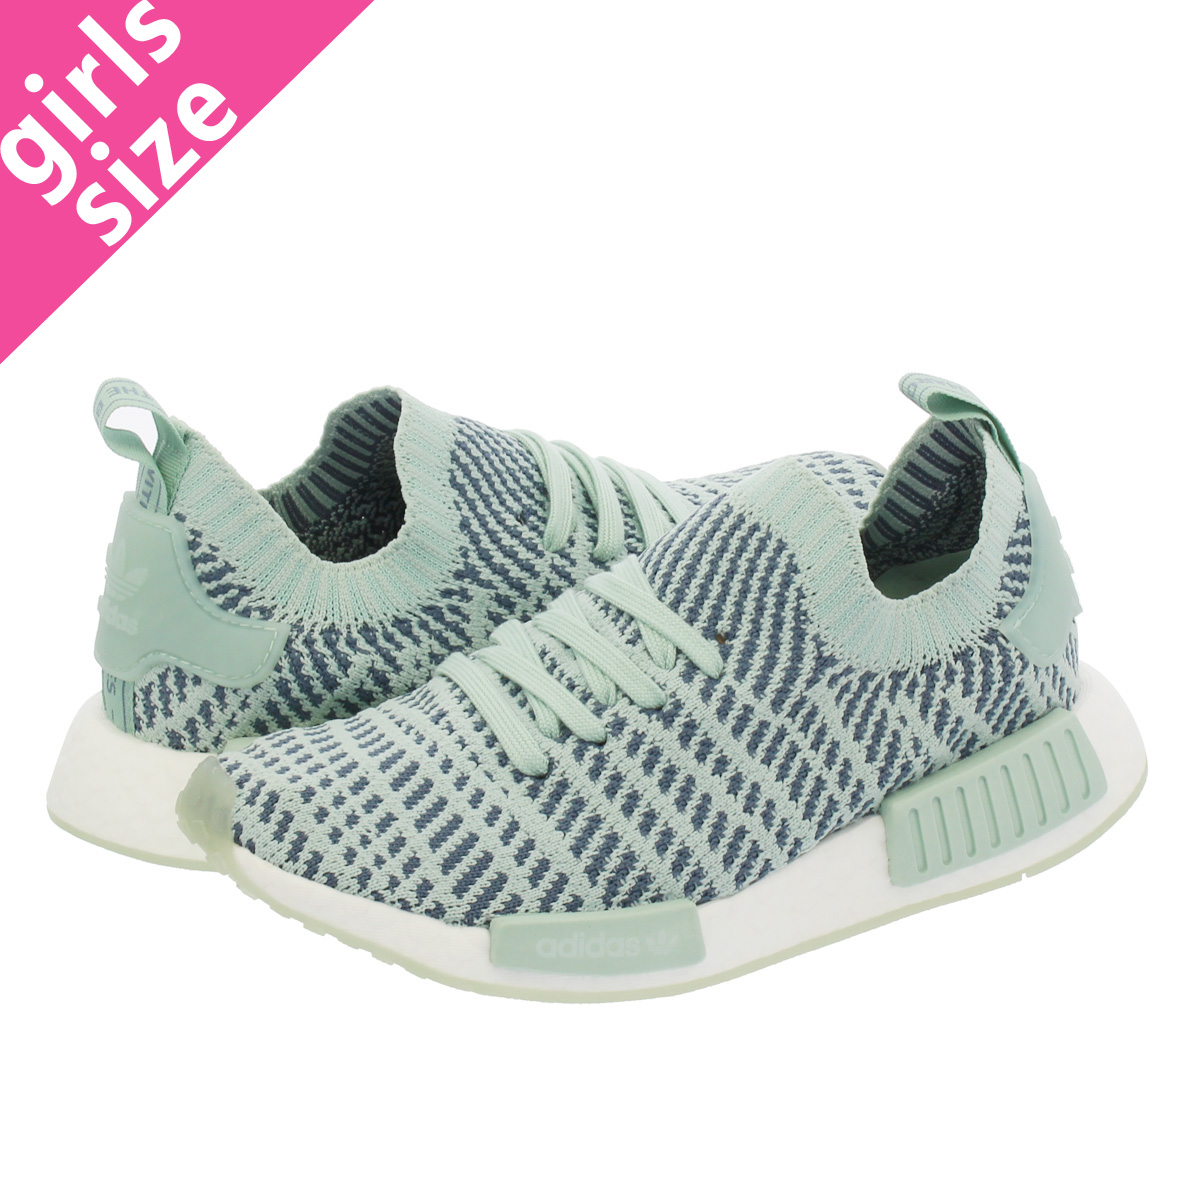 huge discount db6cf 3f81c adidas NMD_R1 STLT PK W Adidas NMD R1 STLT PK W ASH GREEN/LOW STEEL/RUNNING  WHITE RAW